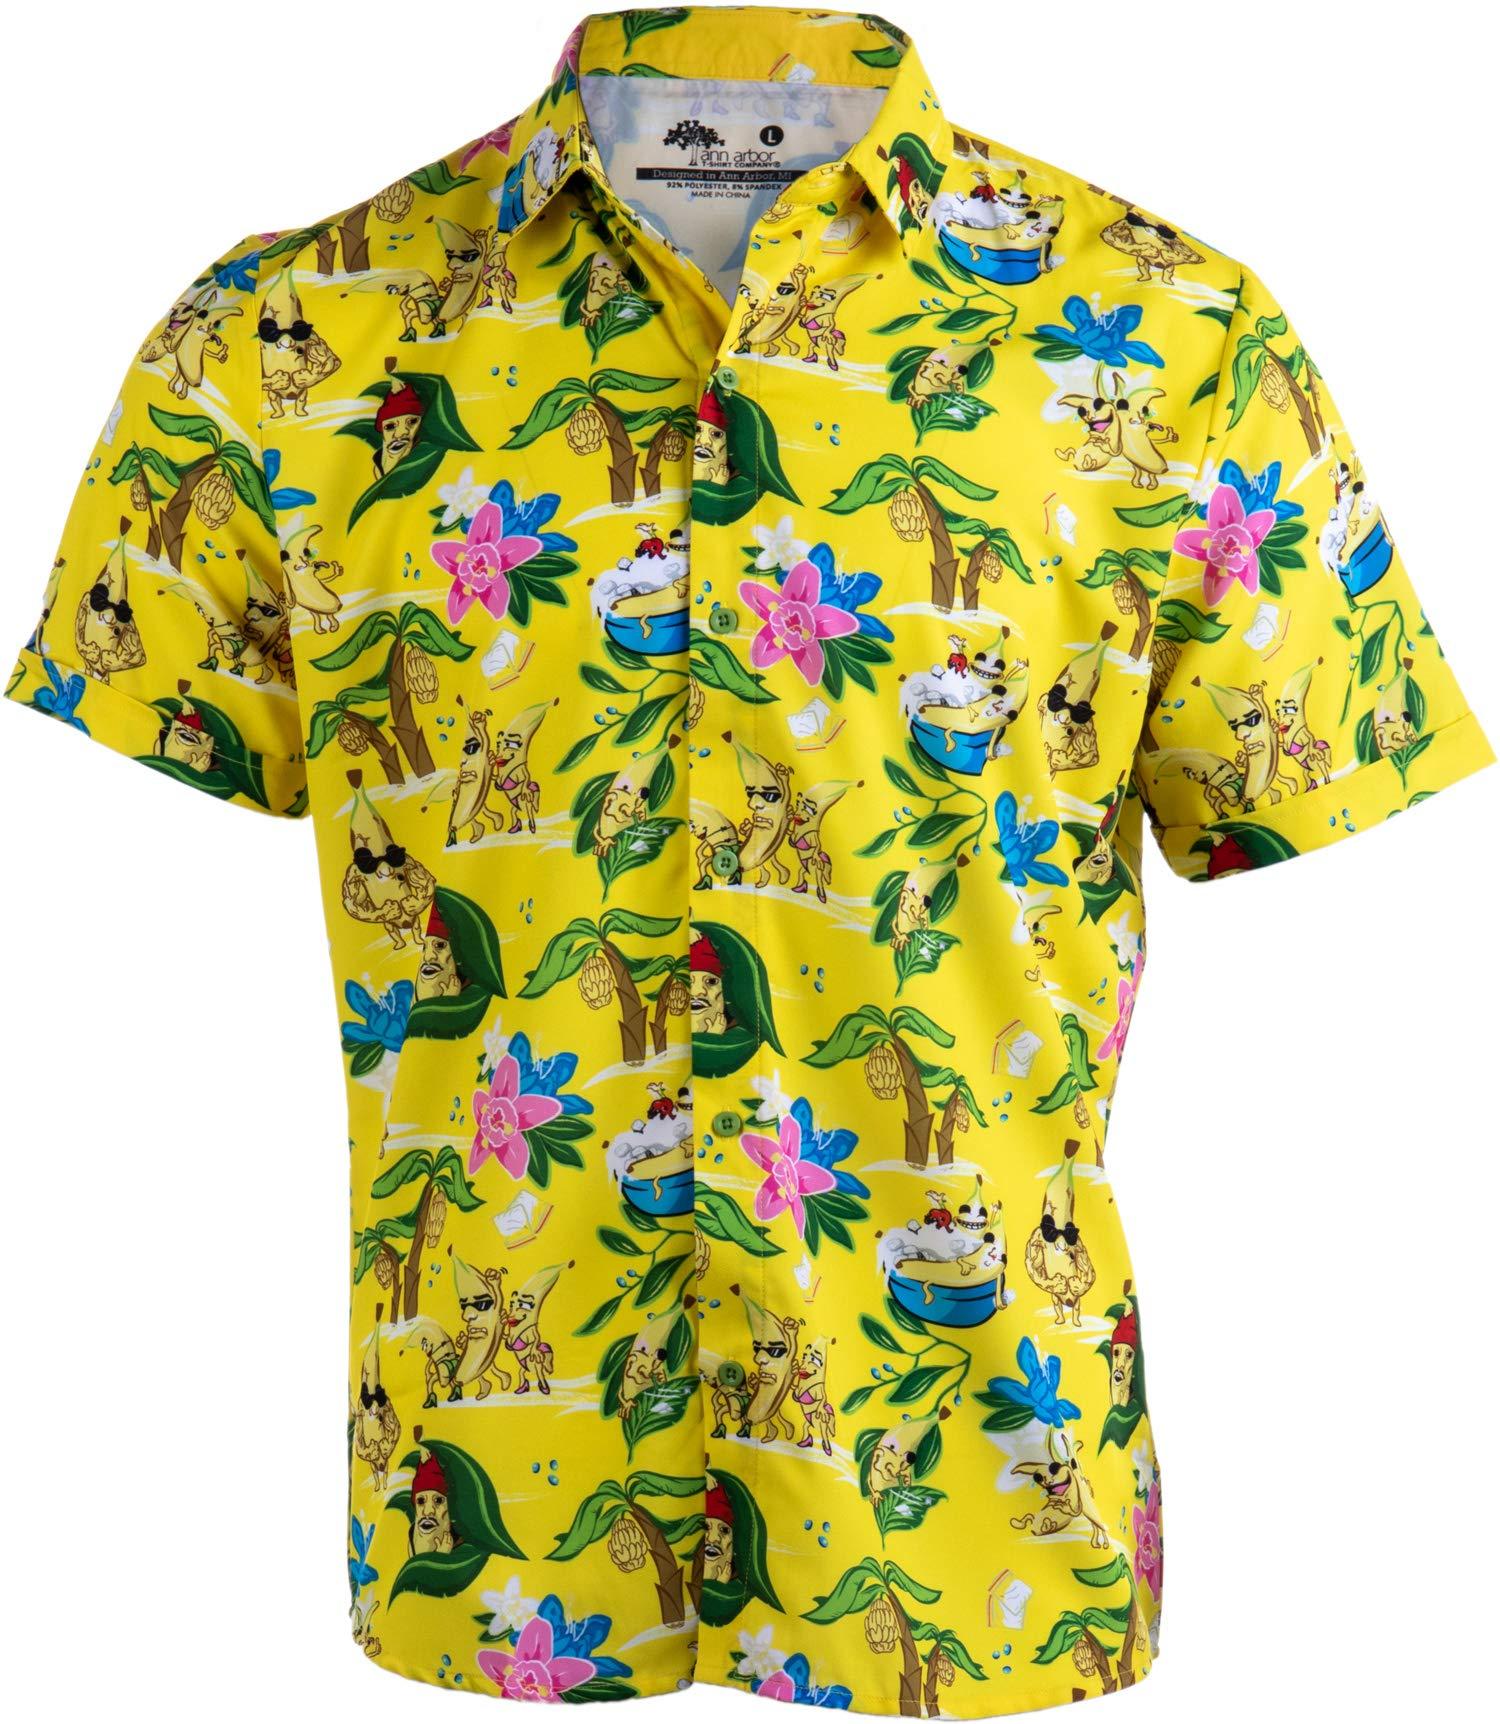 Bananas & Blow | Funny Cool Hawaiian Button Down Polo Golf Party Shirt for Men-(Collar,2XL) Yellow by Ann Arbor T-shirt Co.